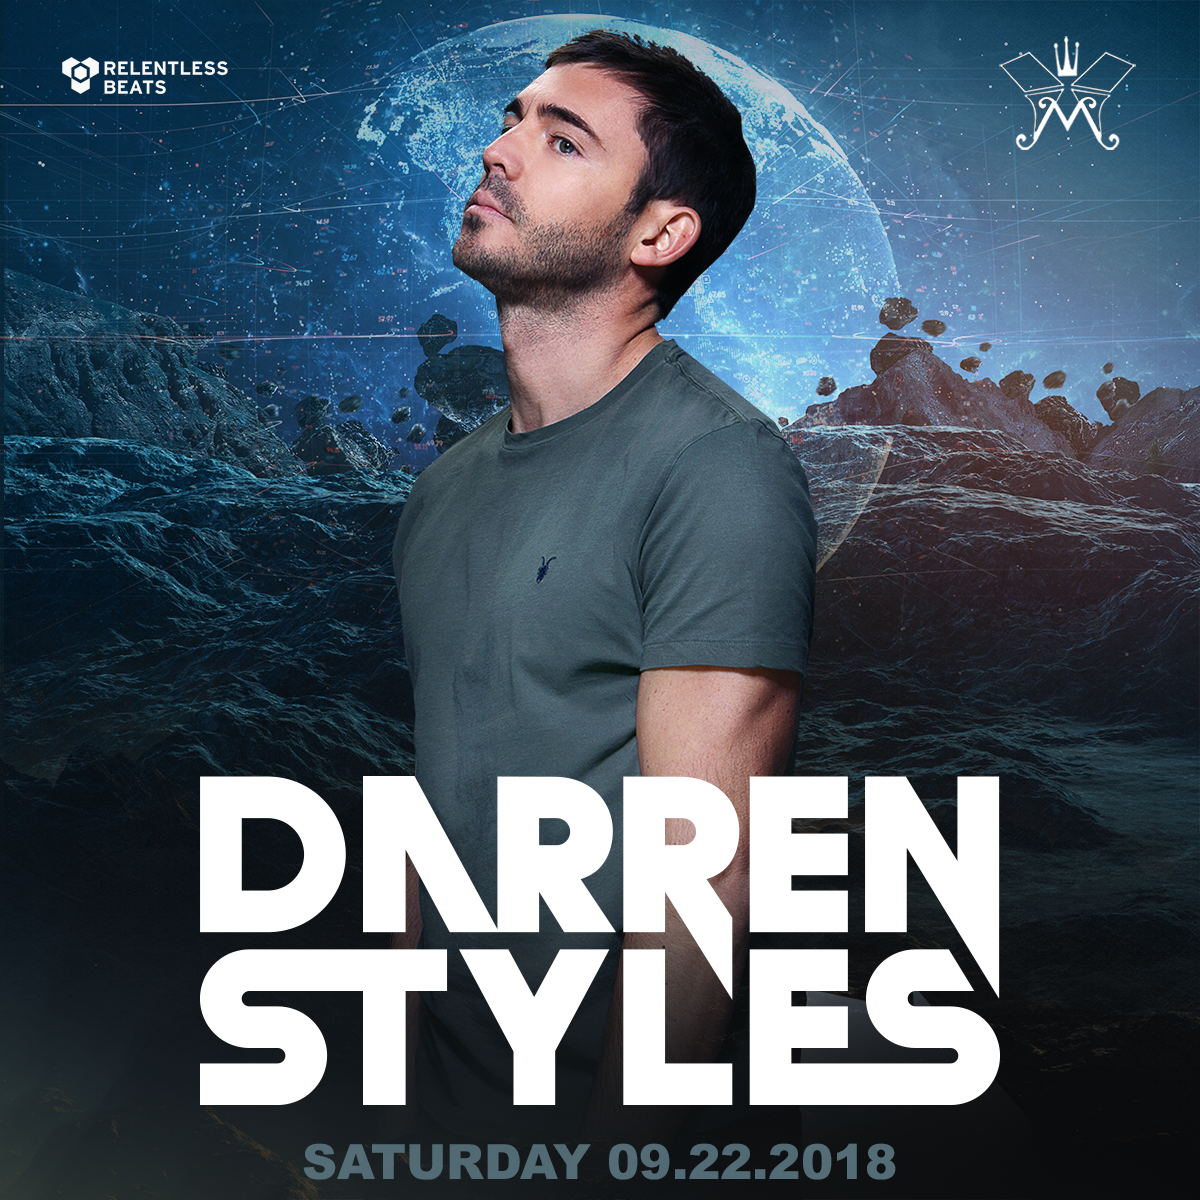 Flyer for Darren Styles